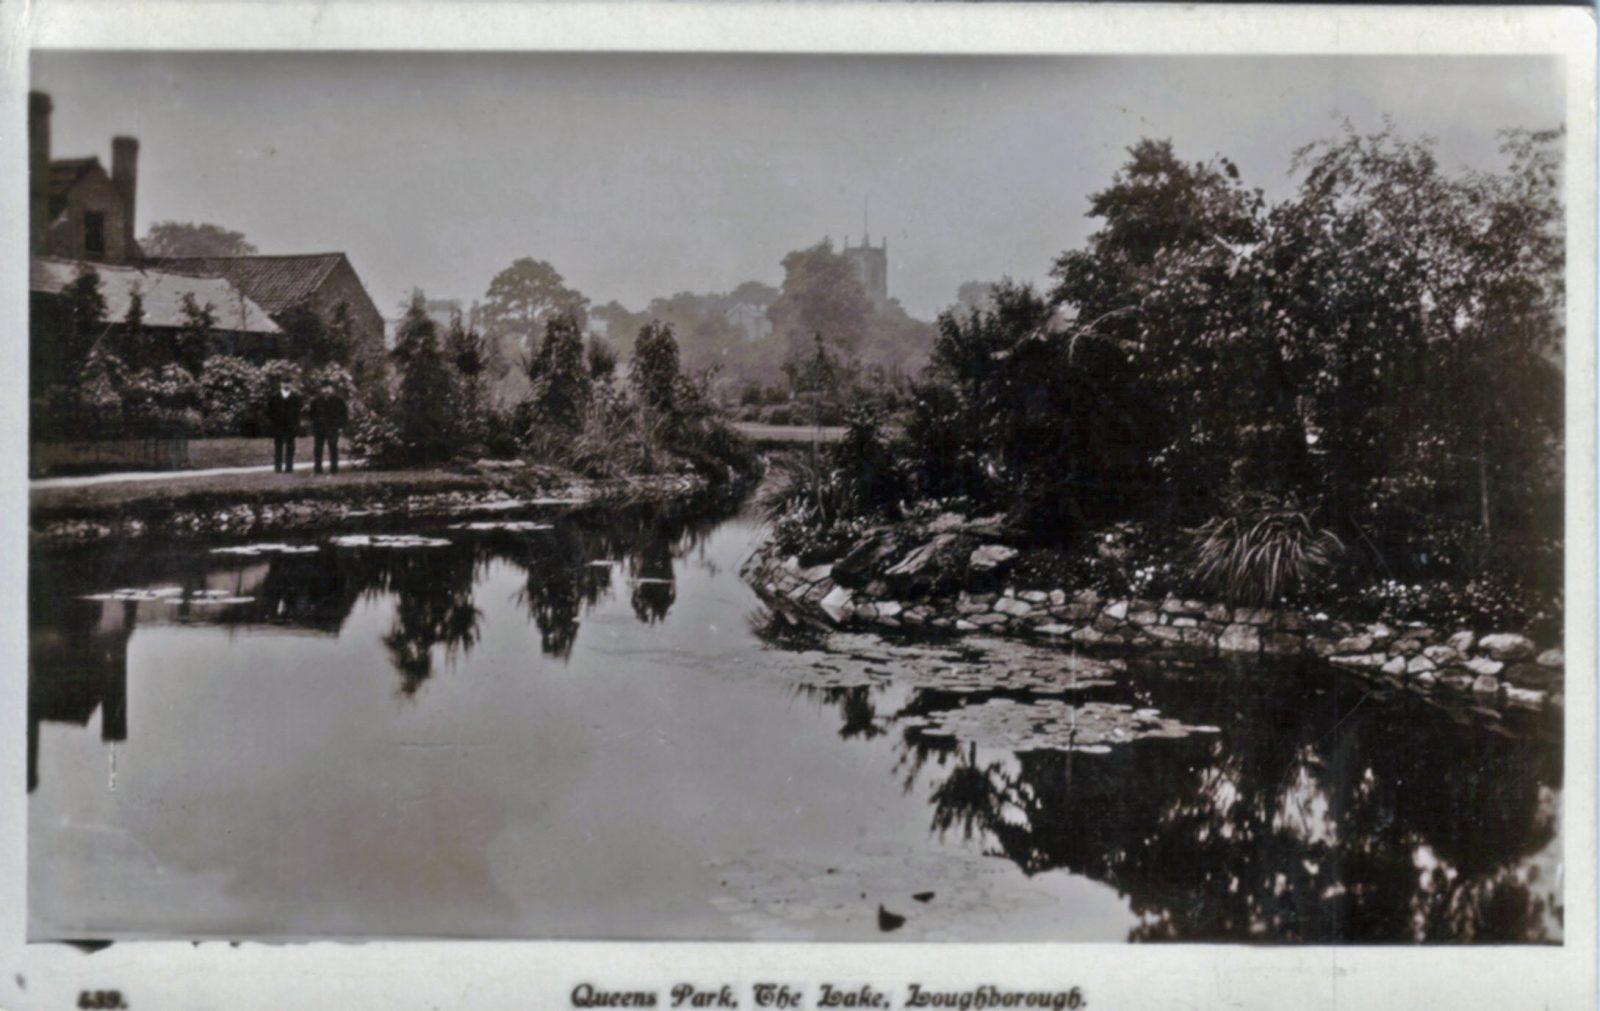 Queens Park, Loughborough. 1921-1940: The lake. (File:1259)